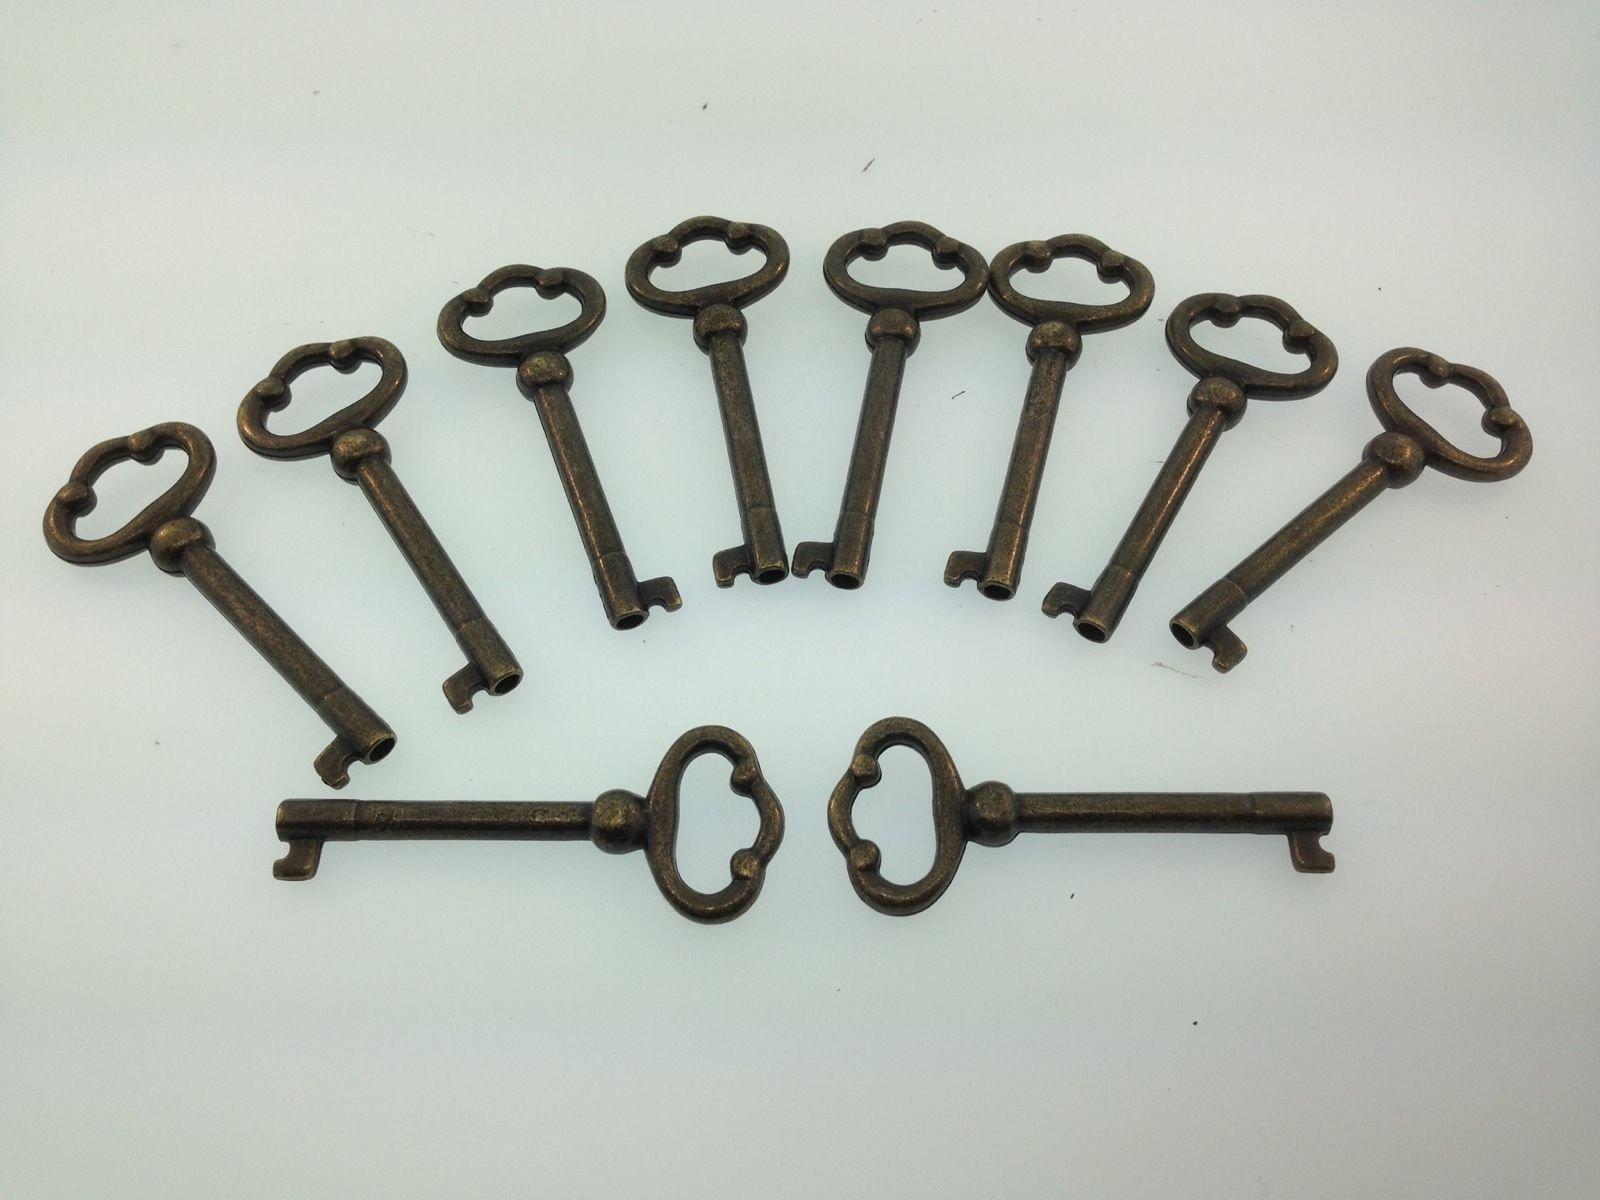 Grandfather clock or Curio cabinet door key set of 10 Antique Finish